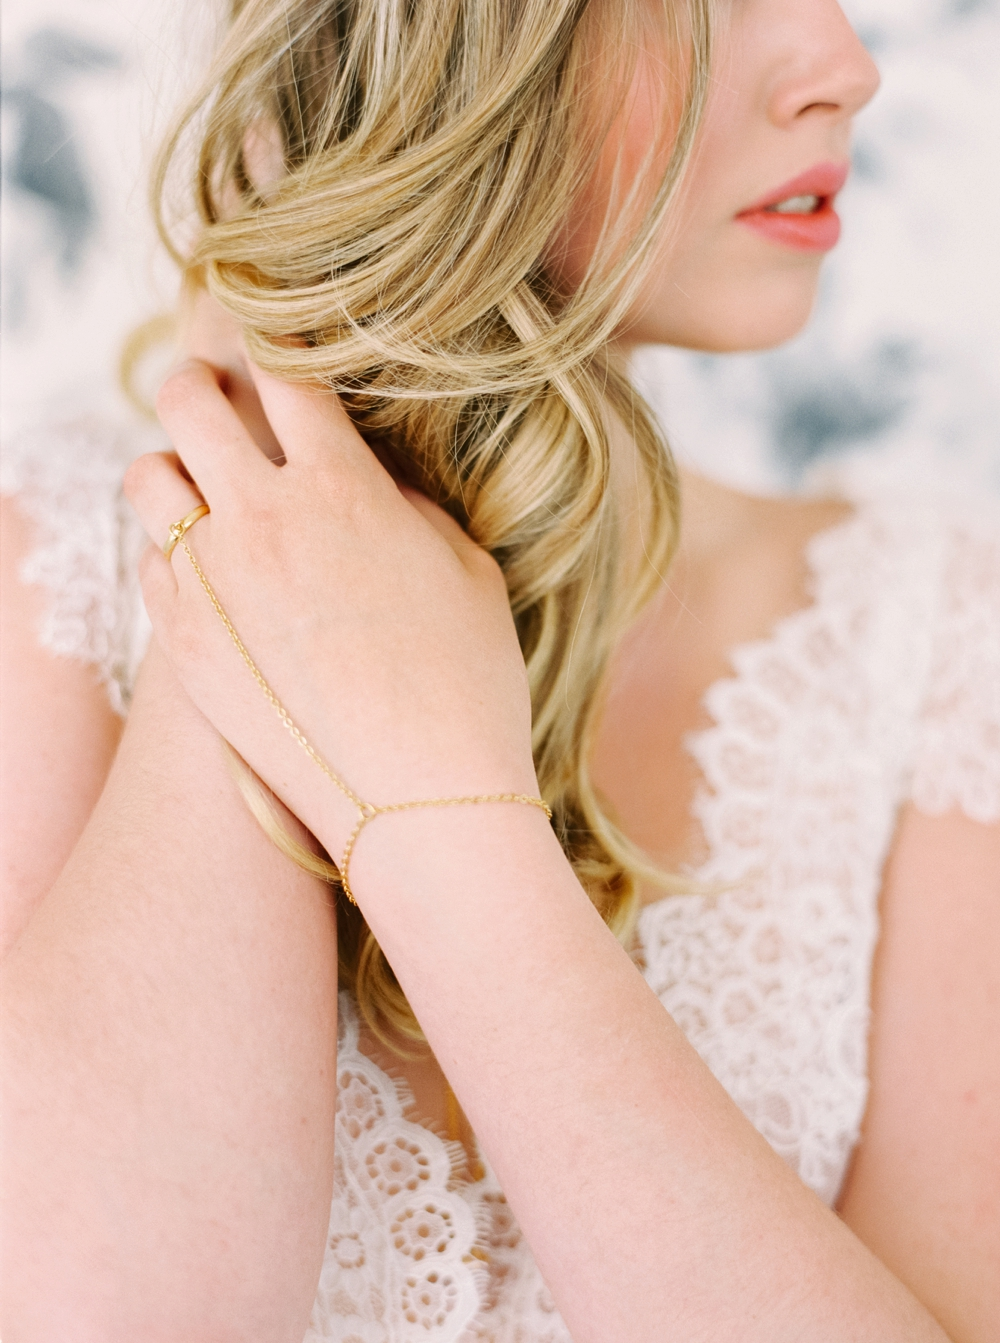 Calgary Boudoir Photographers | Luminous The Workshop | Bridal Boudoir | Pearl & Dot